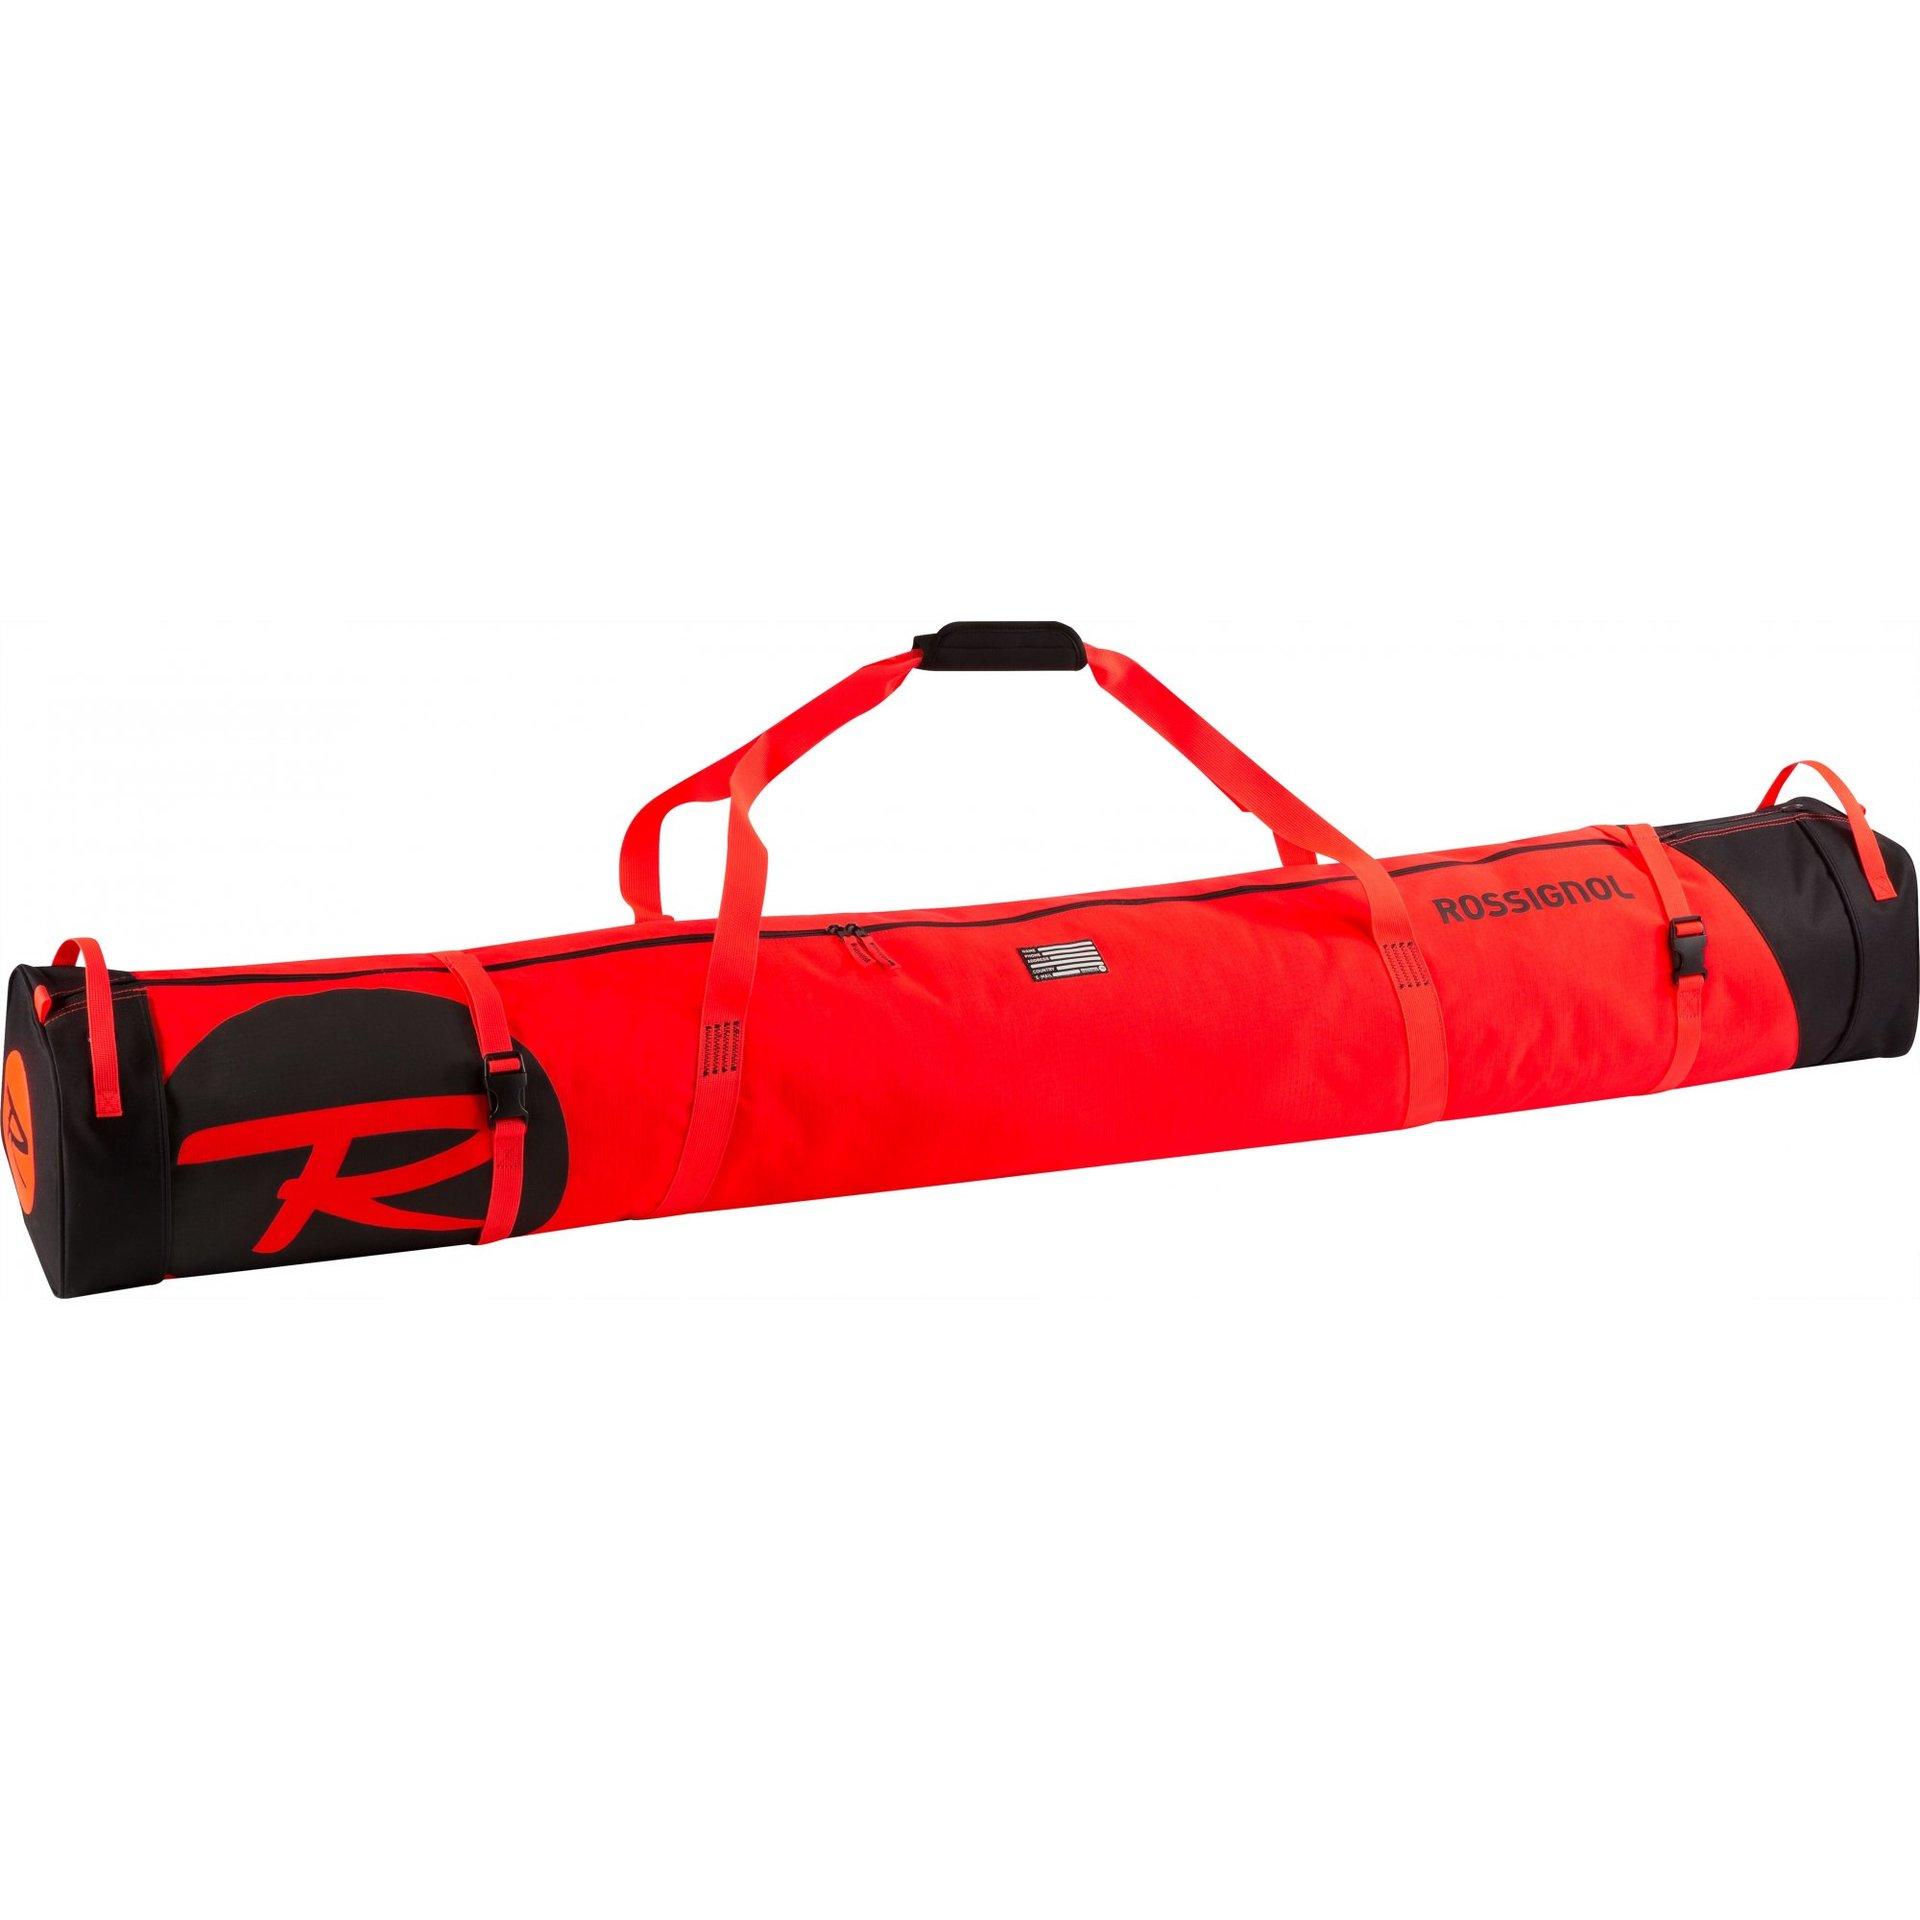 POKROWIEC NA NARTY ROSSIGNOL HERO JR SKI BAG 170 CM RED 1